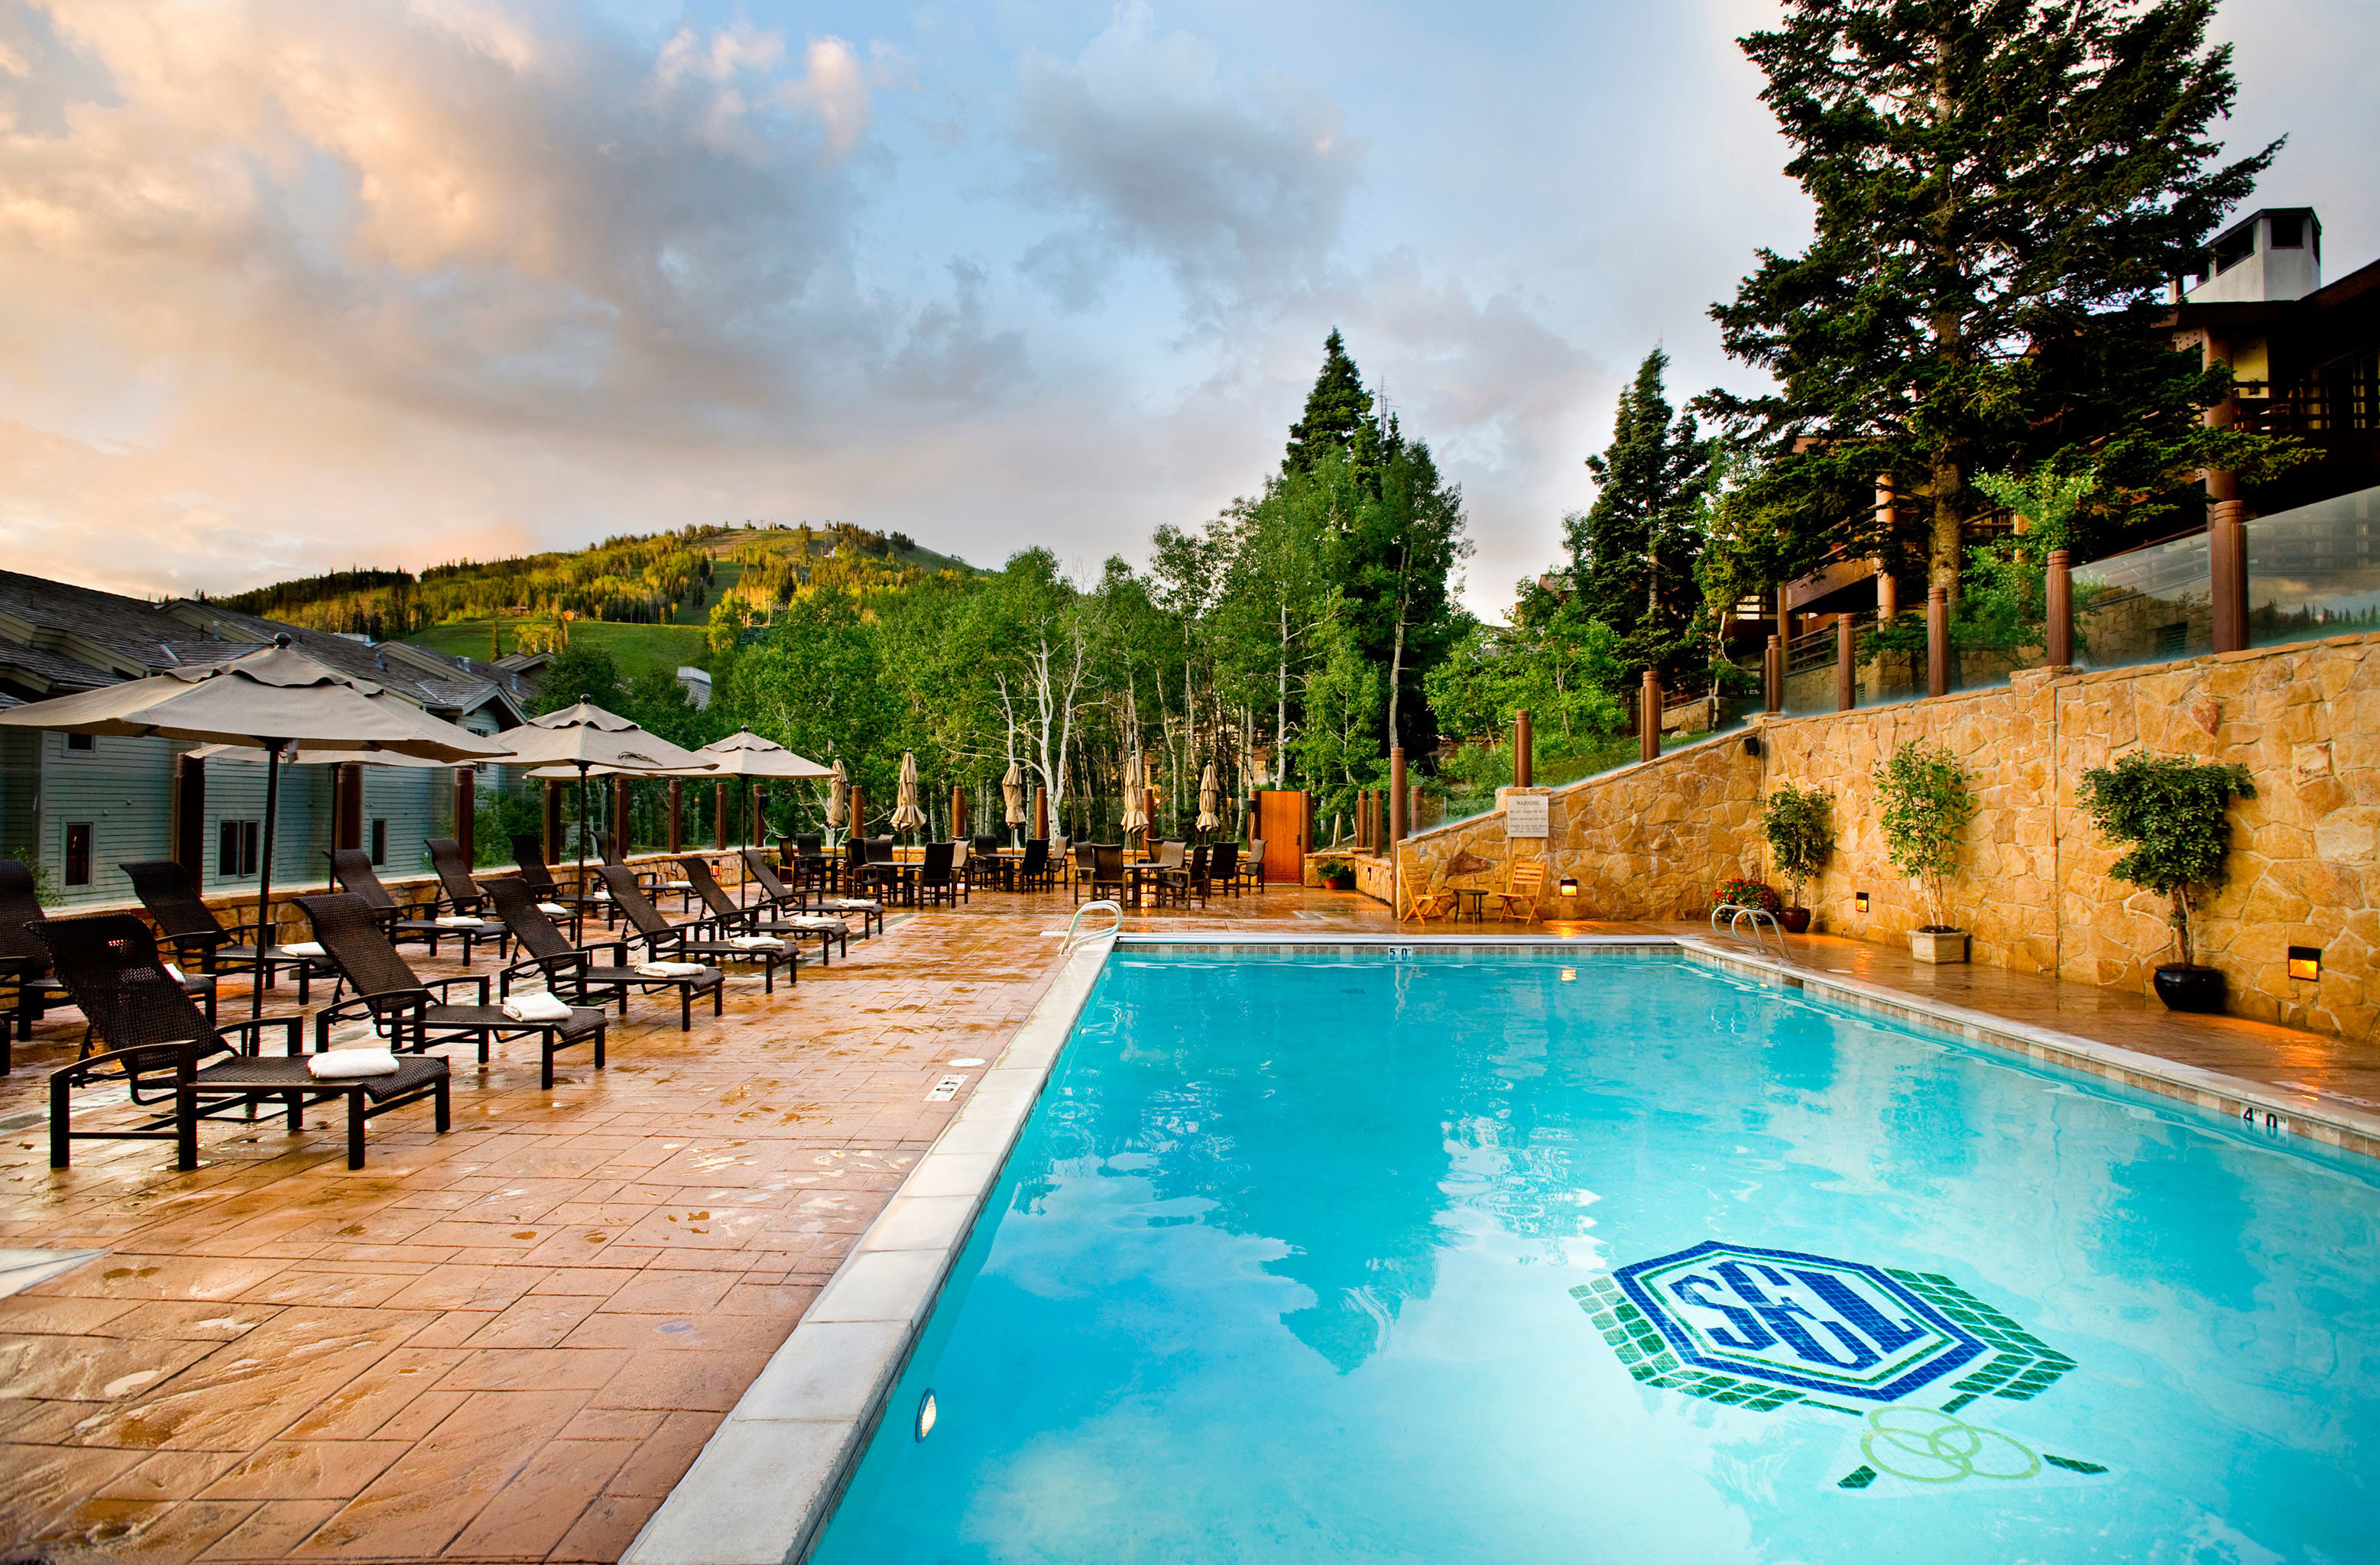 Lodge Patio Pool Rustic Scenic views Terrace sky ground swimming pool leisure Resort Sea lined